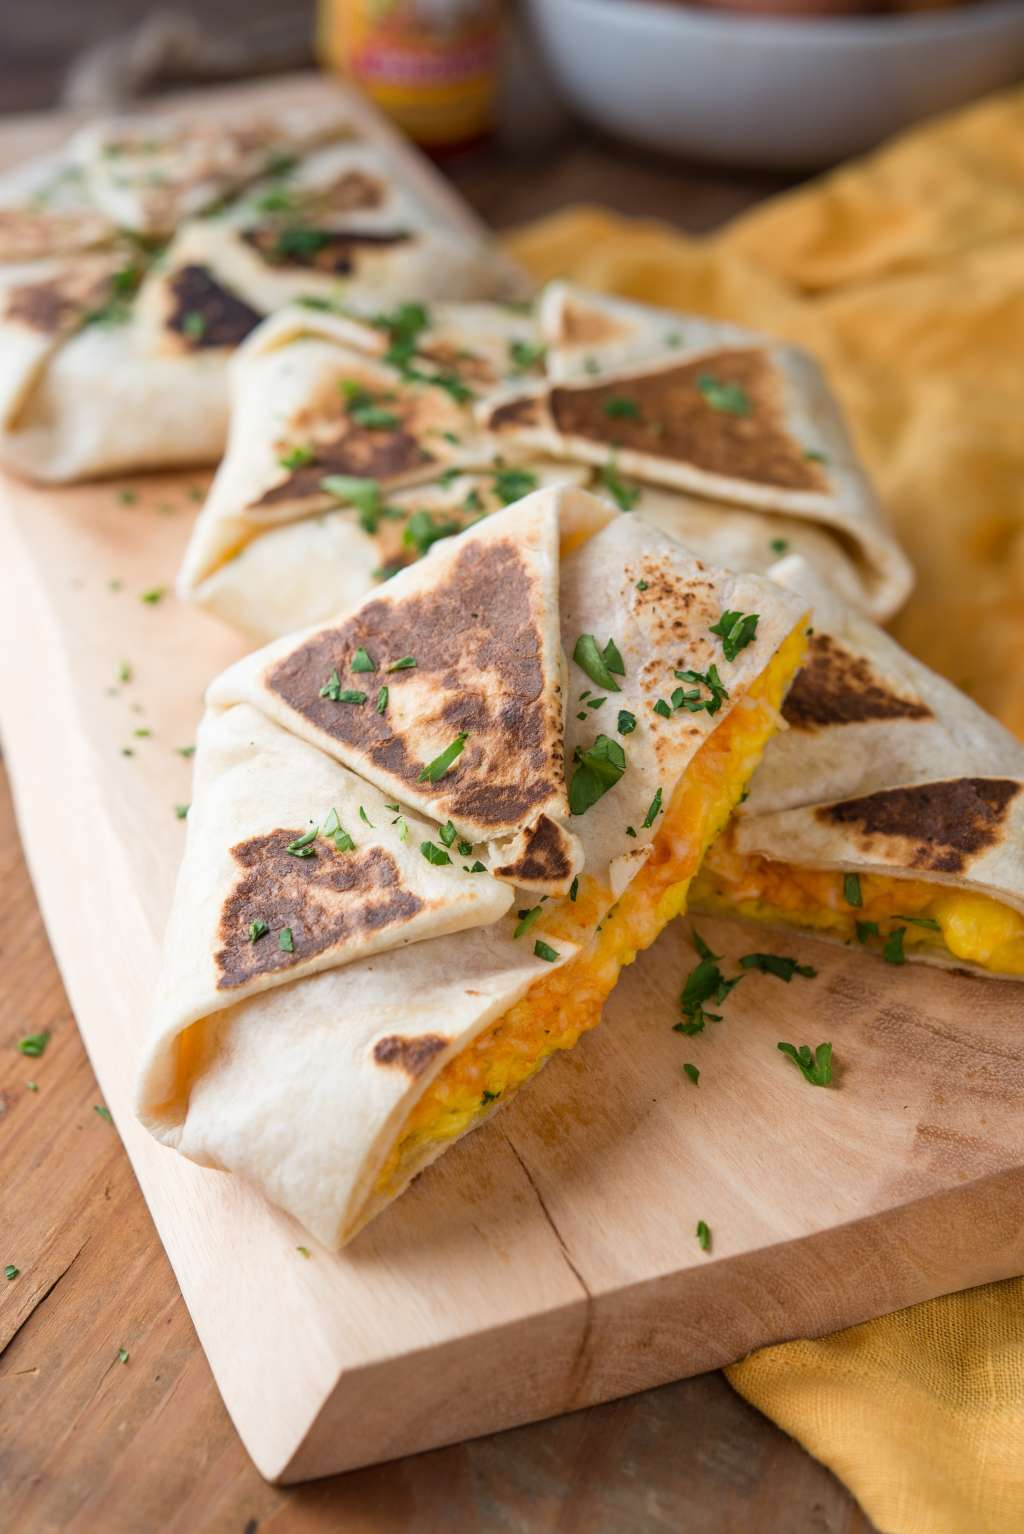 Recipe: The Wrapped Breakfast Quesadilla